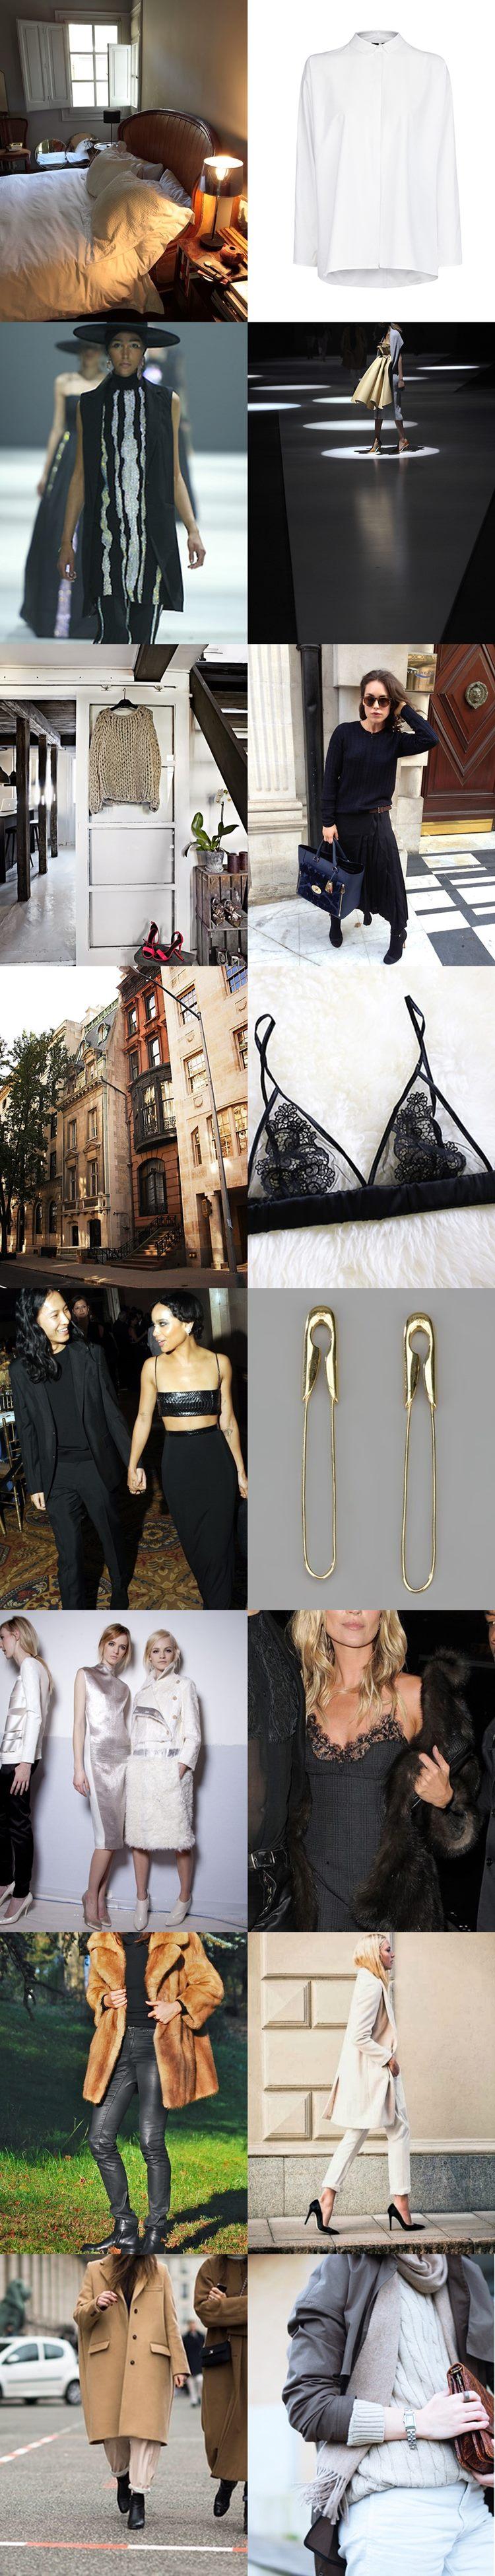 Street style, fashion, deco